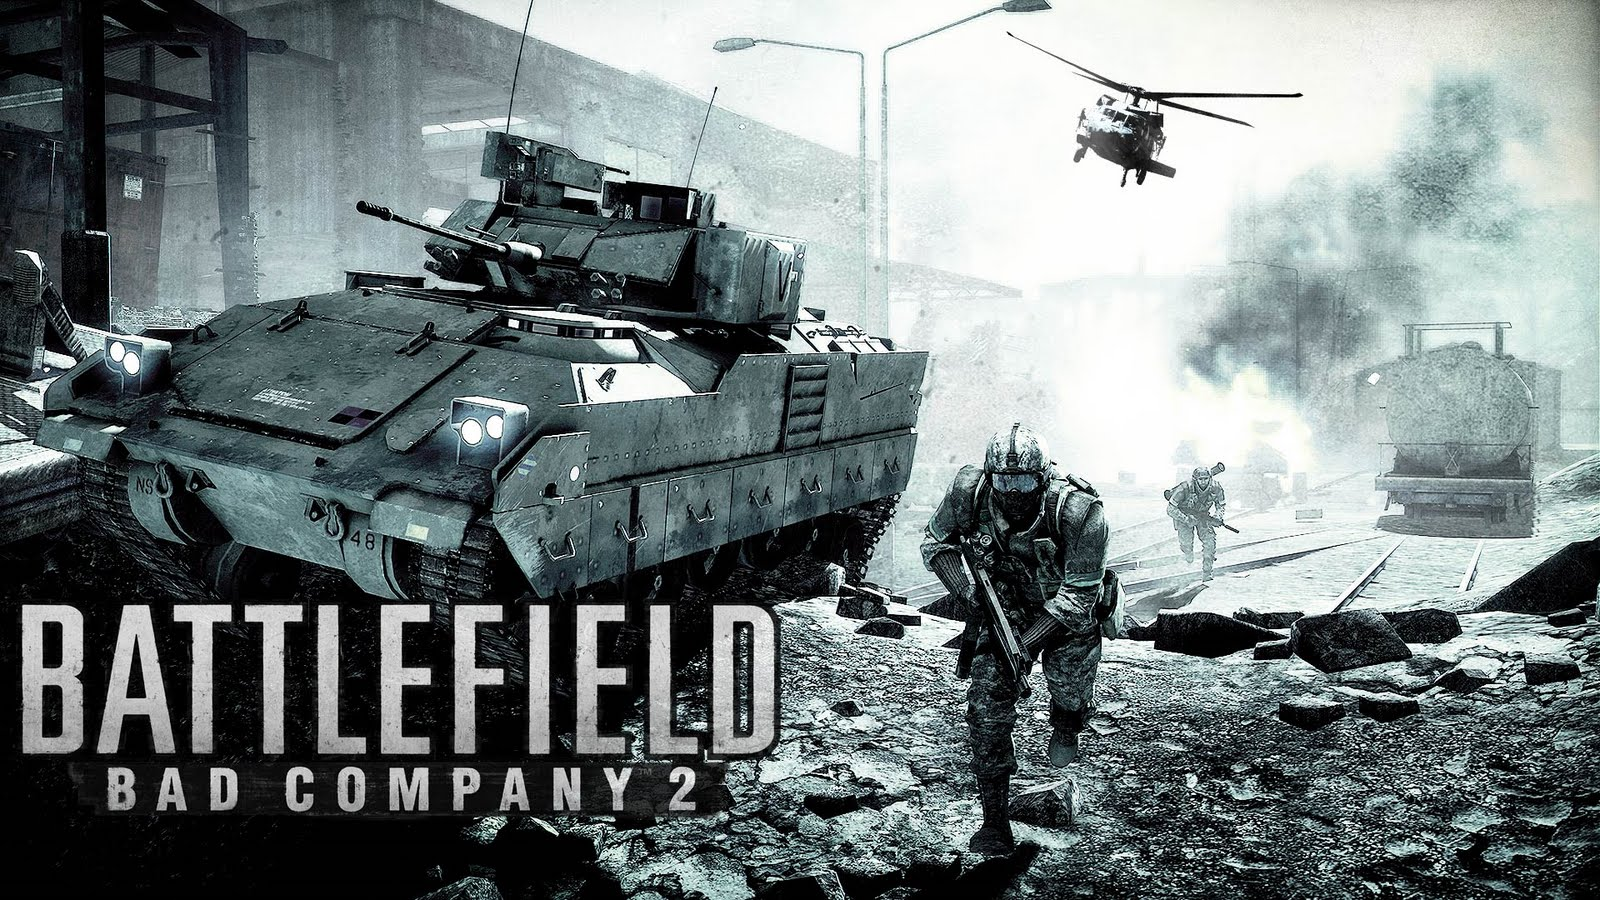 http://1.bp.blogspot.com/-MCGeq5Rq1ac/TmAktC-rUYI/AAAAAAAAAZg/X5IF2dlhpJg/s1600/Battlefield-Bad-Company-2-HD-wallpaper3.jpg